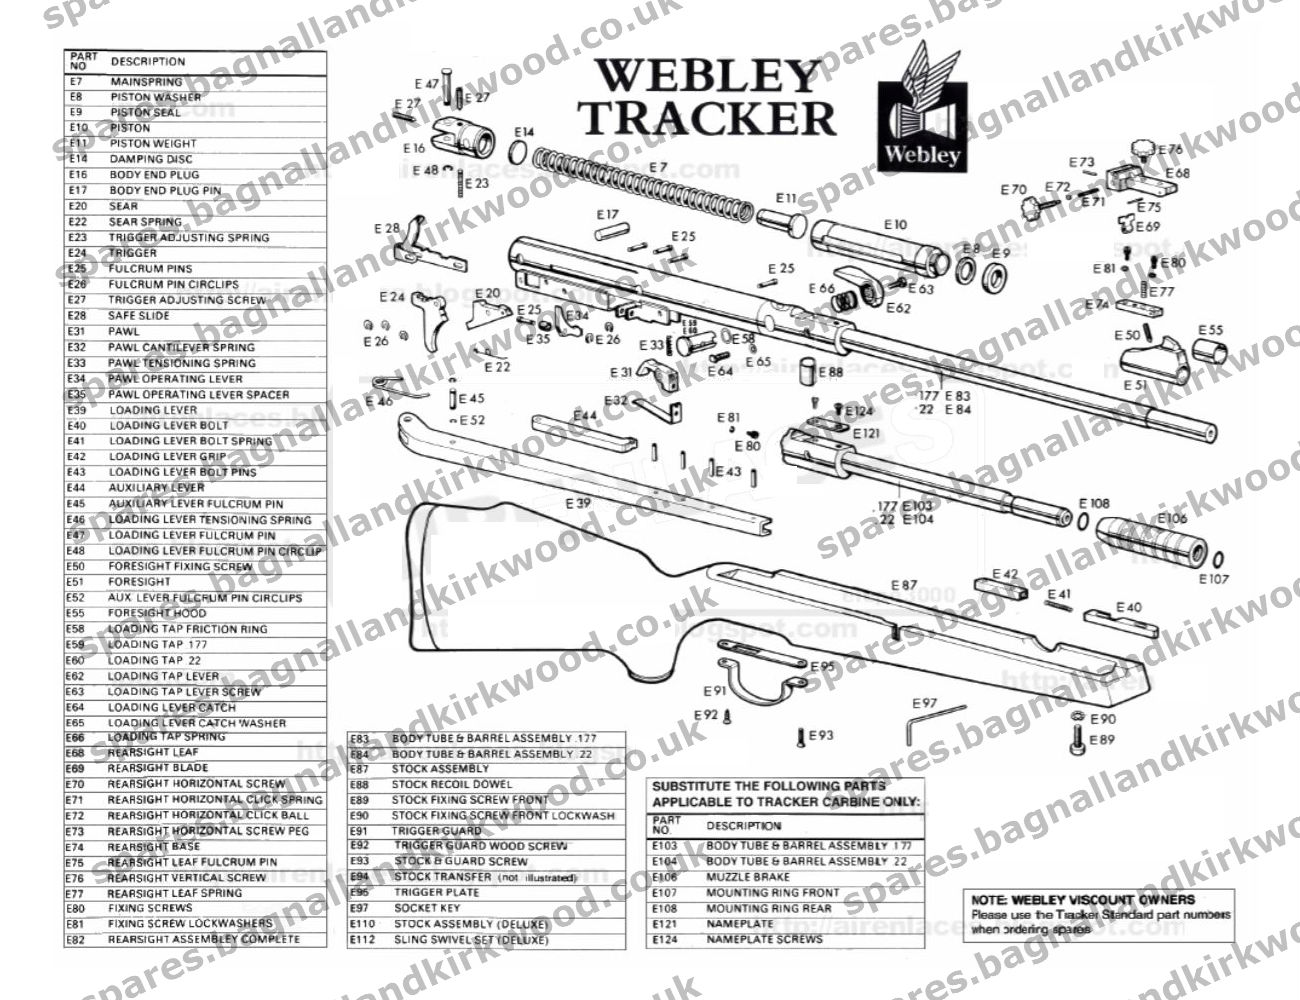 webley tracker spare parts